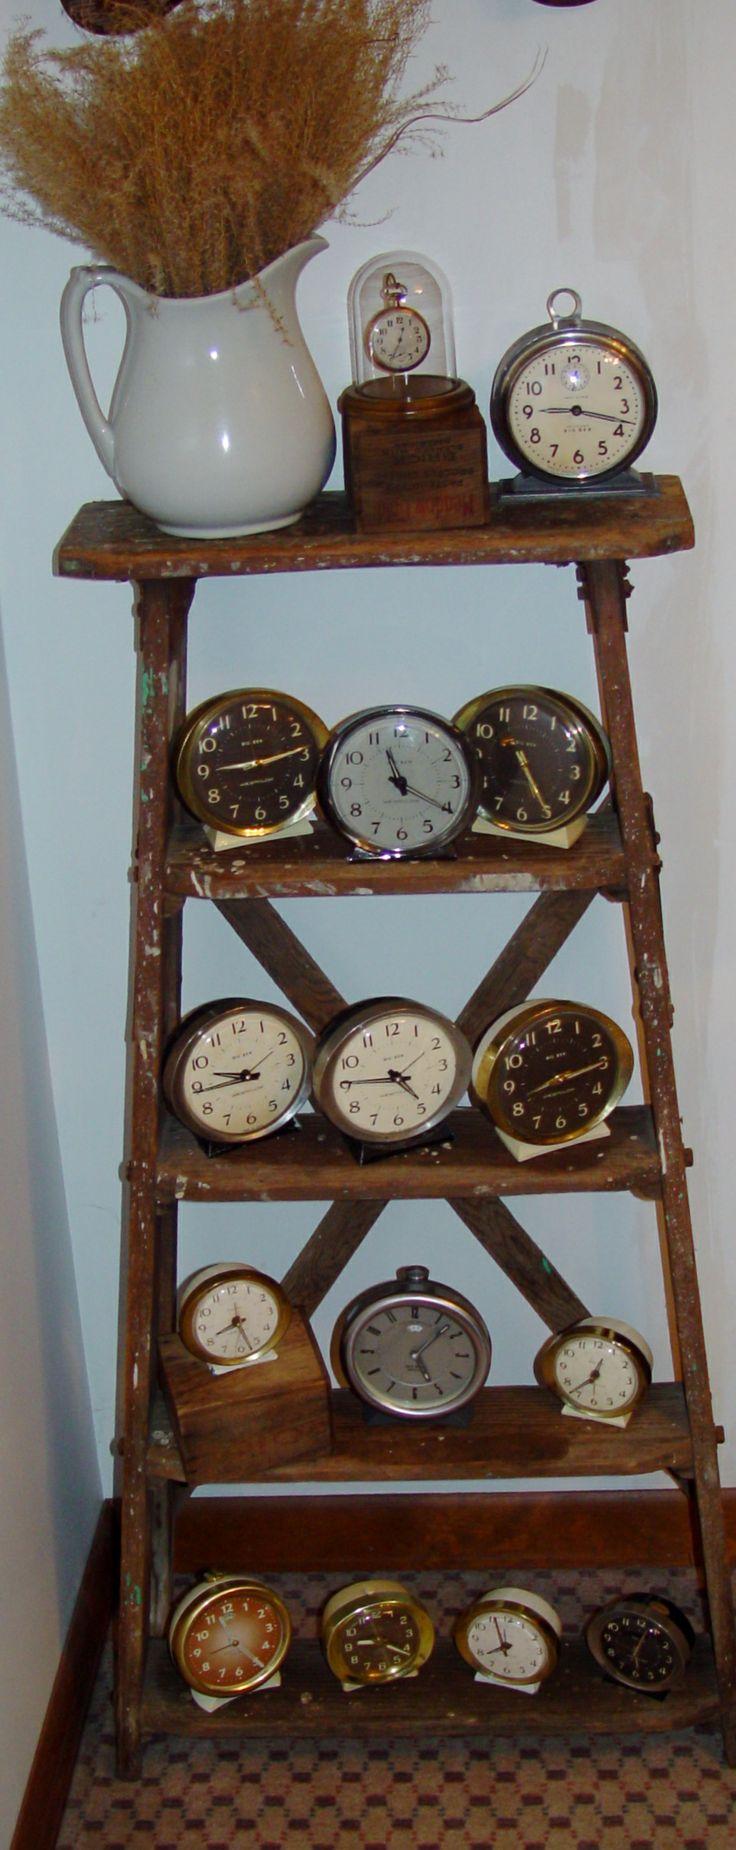 My 20 vintage ladder and Big BenBaby